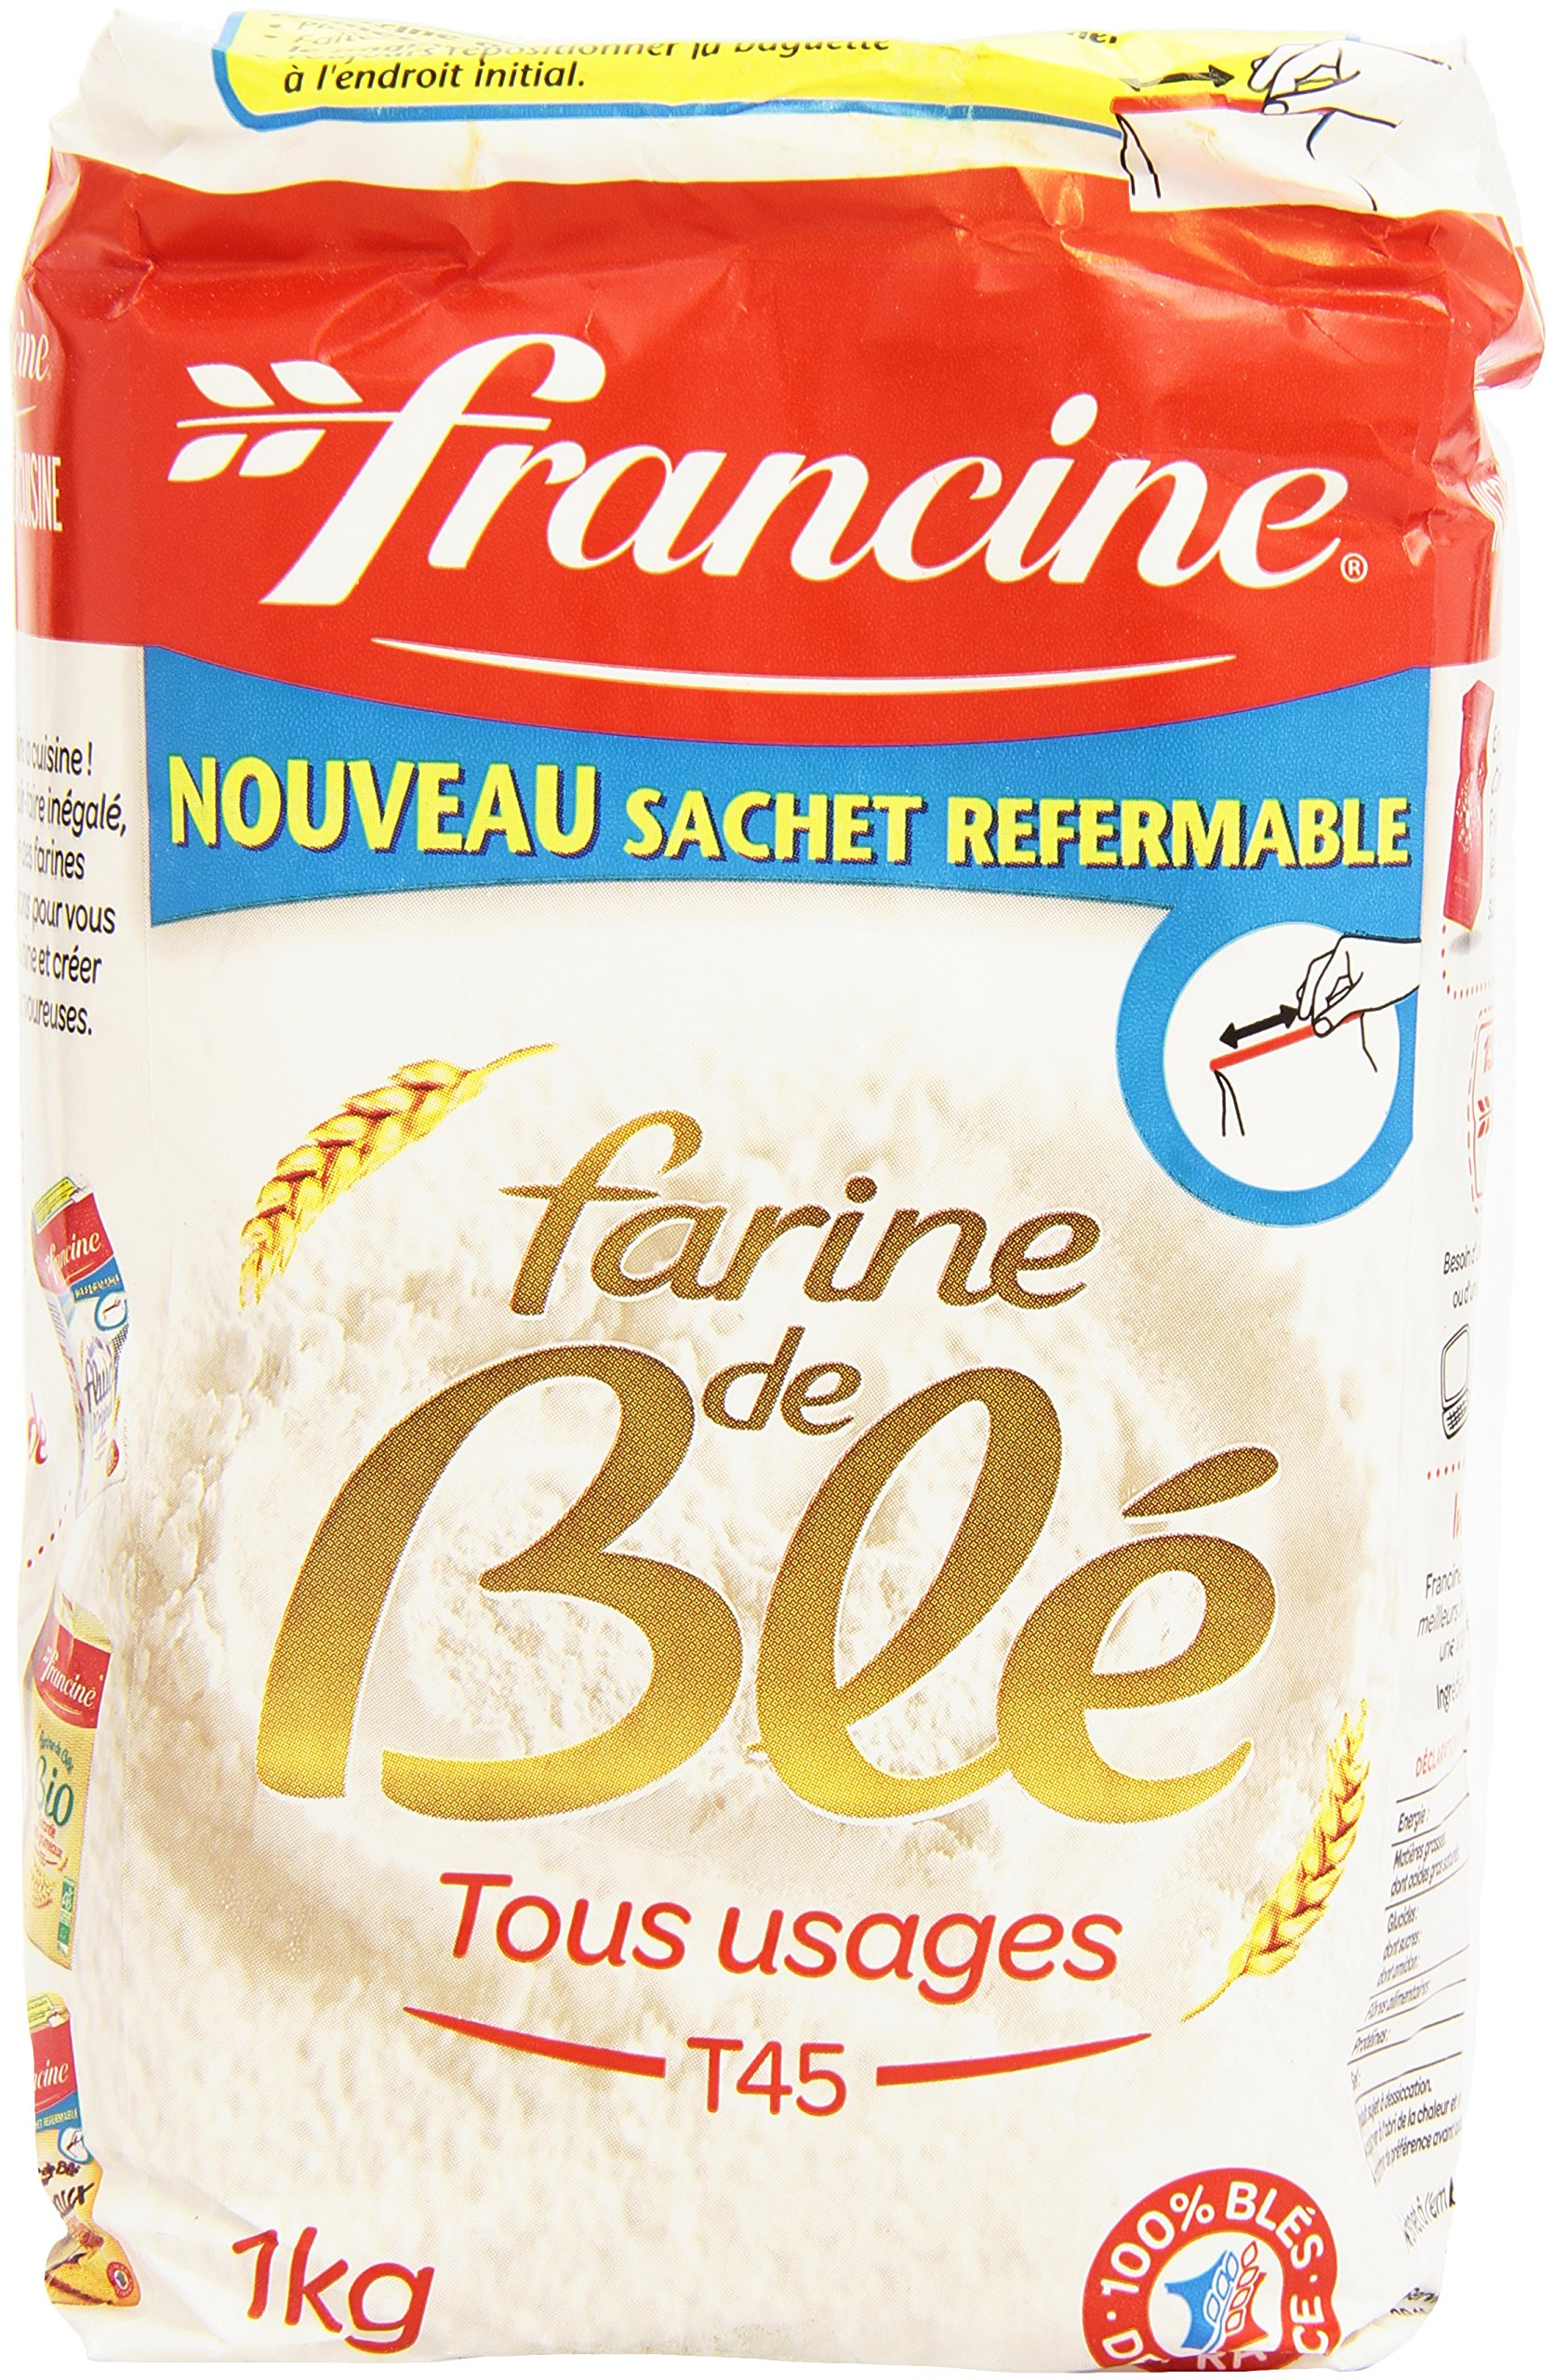 Amazon.com : Alsa - French Cake Baking Powder, 0.38 Ounce